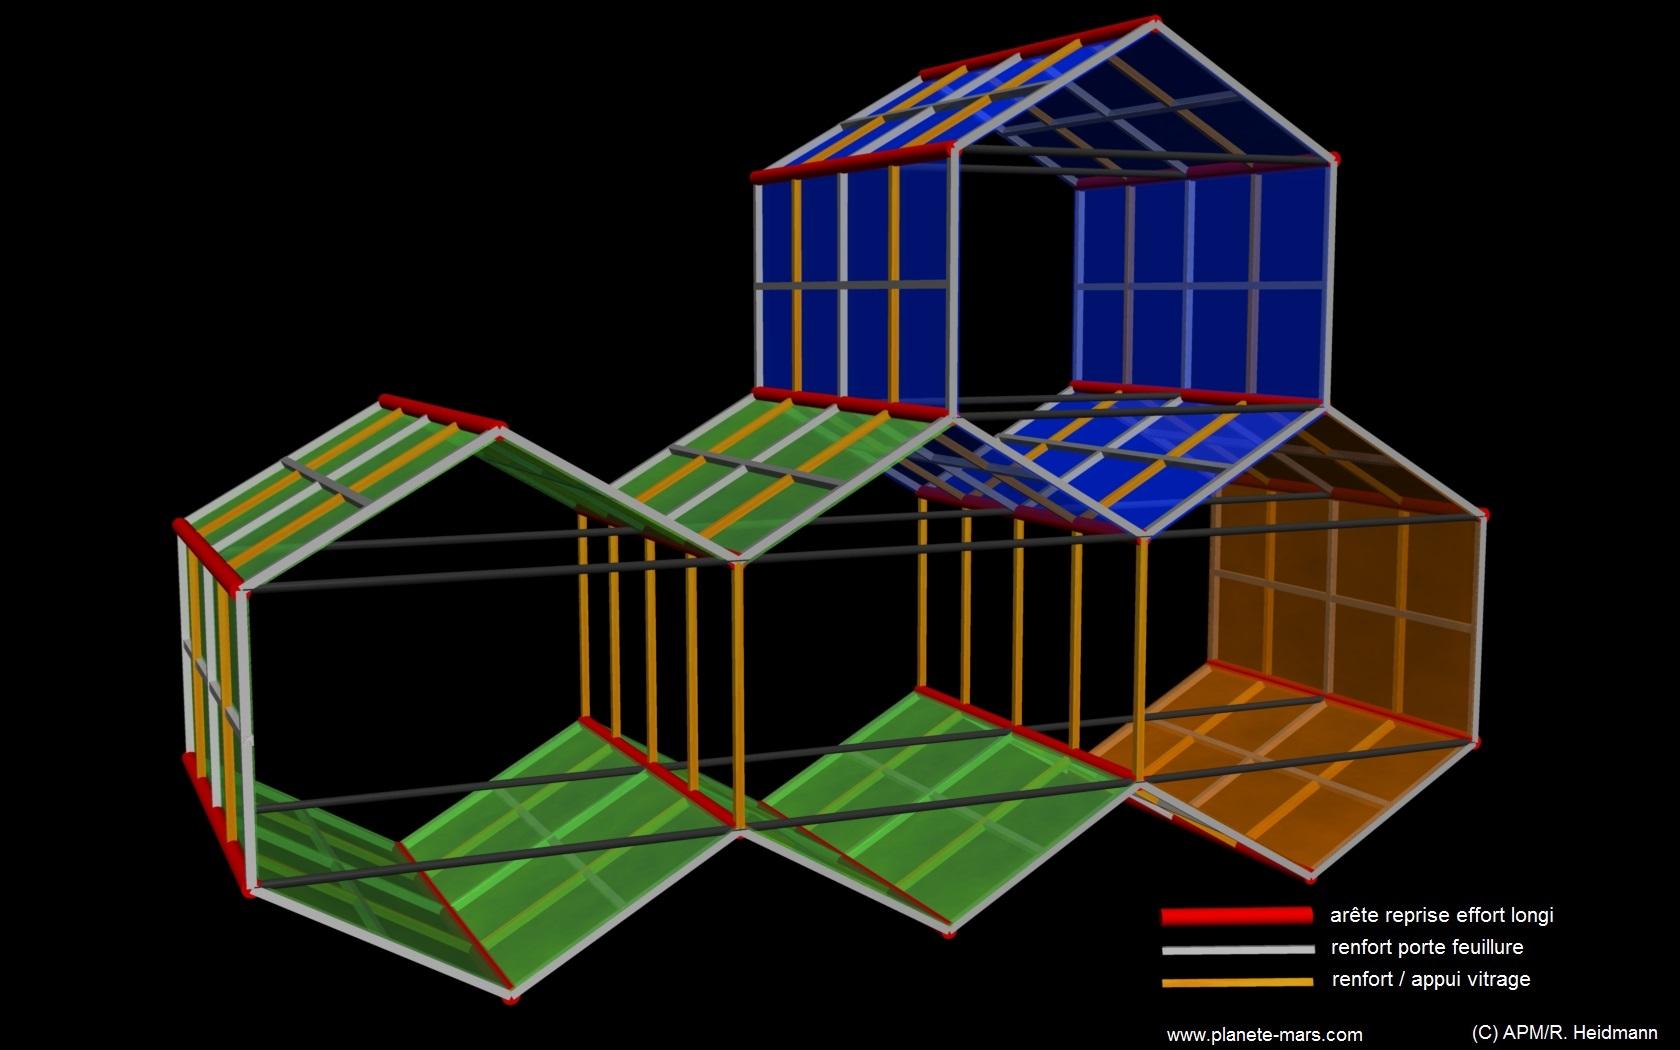 MH_StructuresCadresHab6m